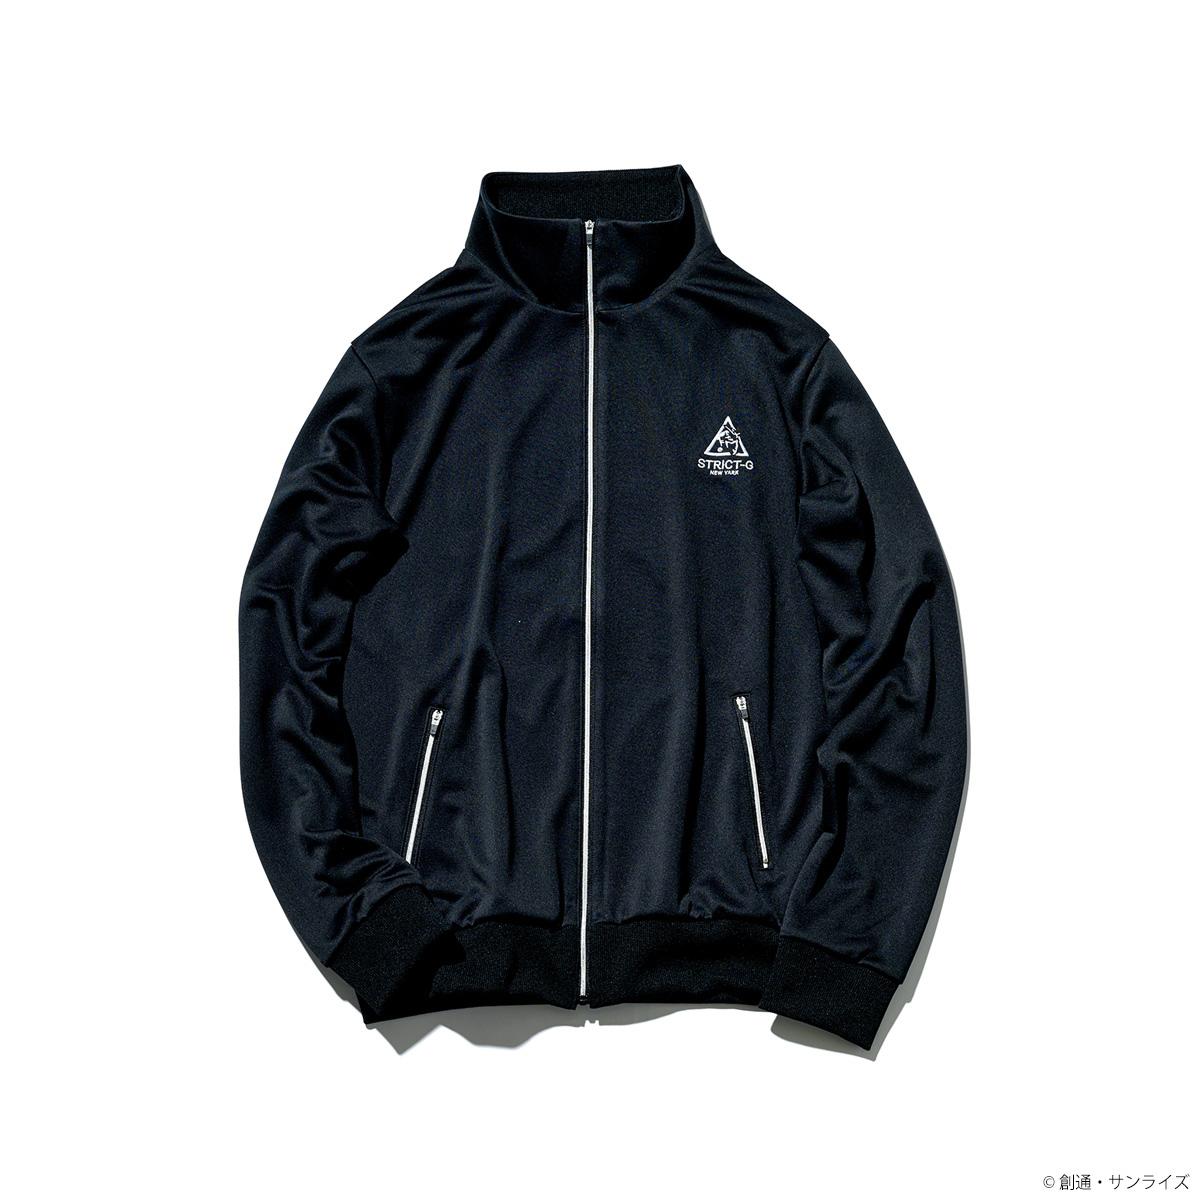 STRICT-G NEW YARK 2019-20 F/Wコレクションよりトラックジャケット他発売!